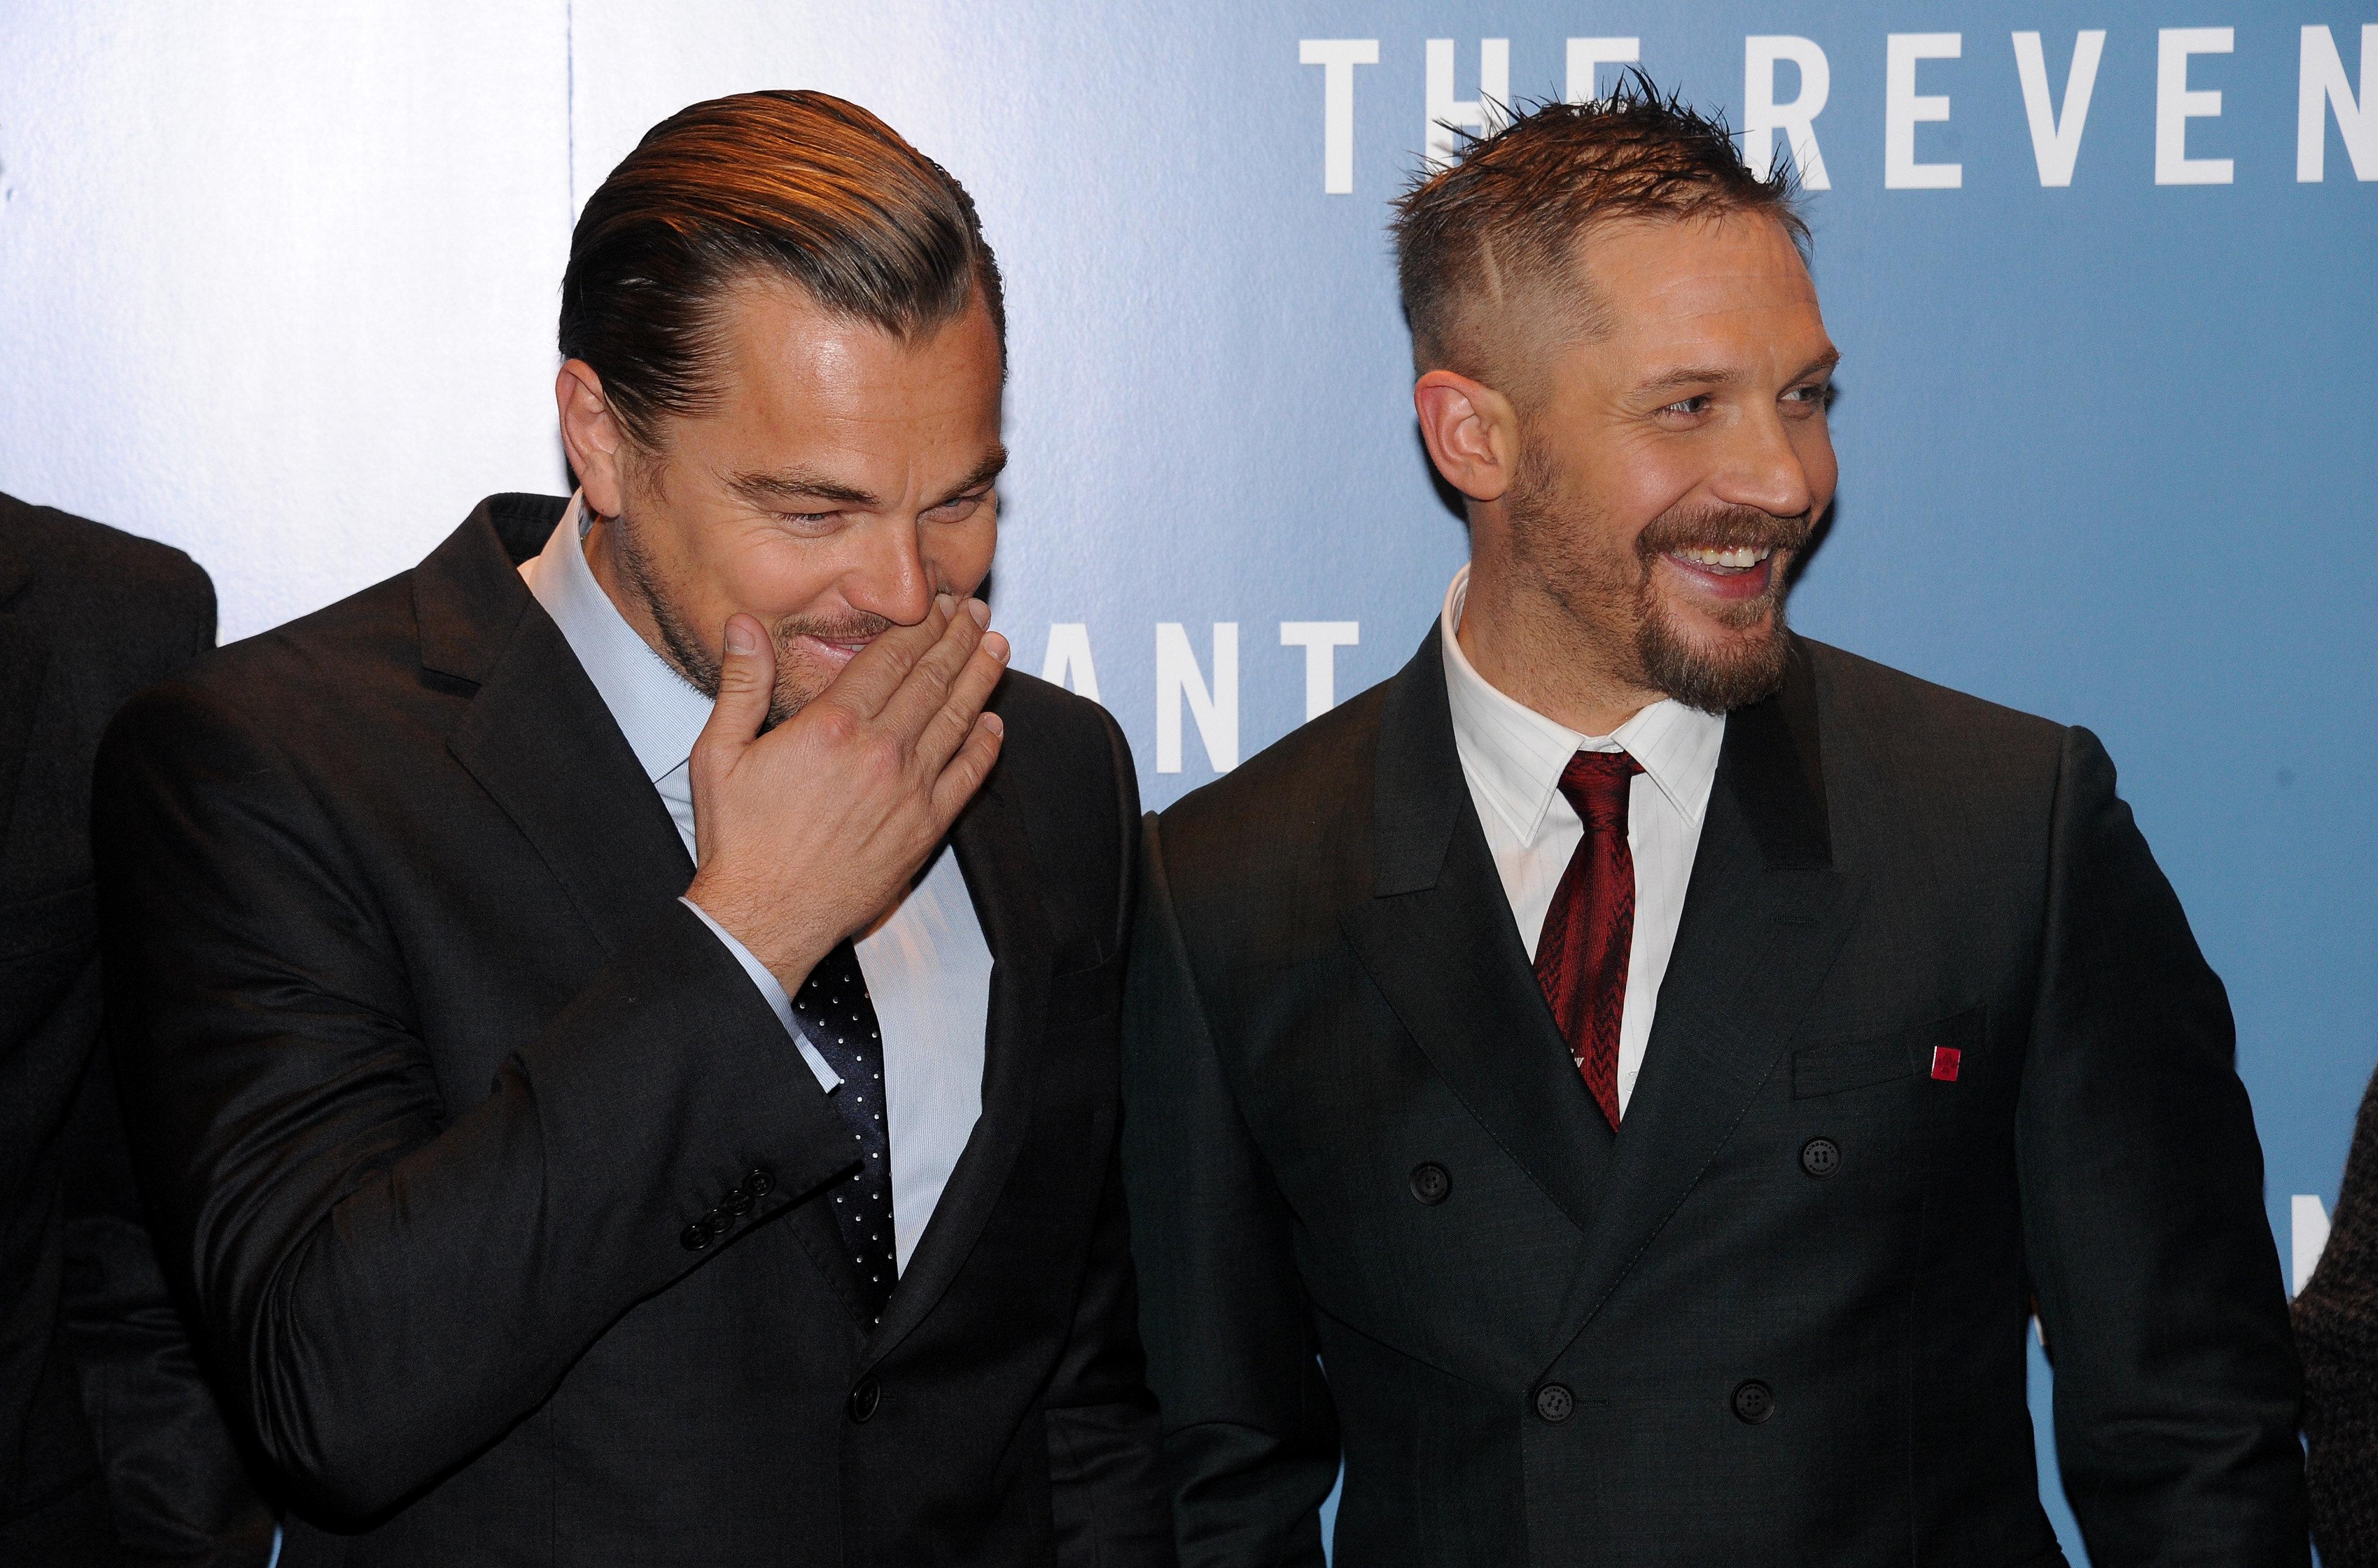 Tom Hardy Has Finally Got His Leonardo DiCaprio Tattoo After Losing Oscars